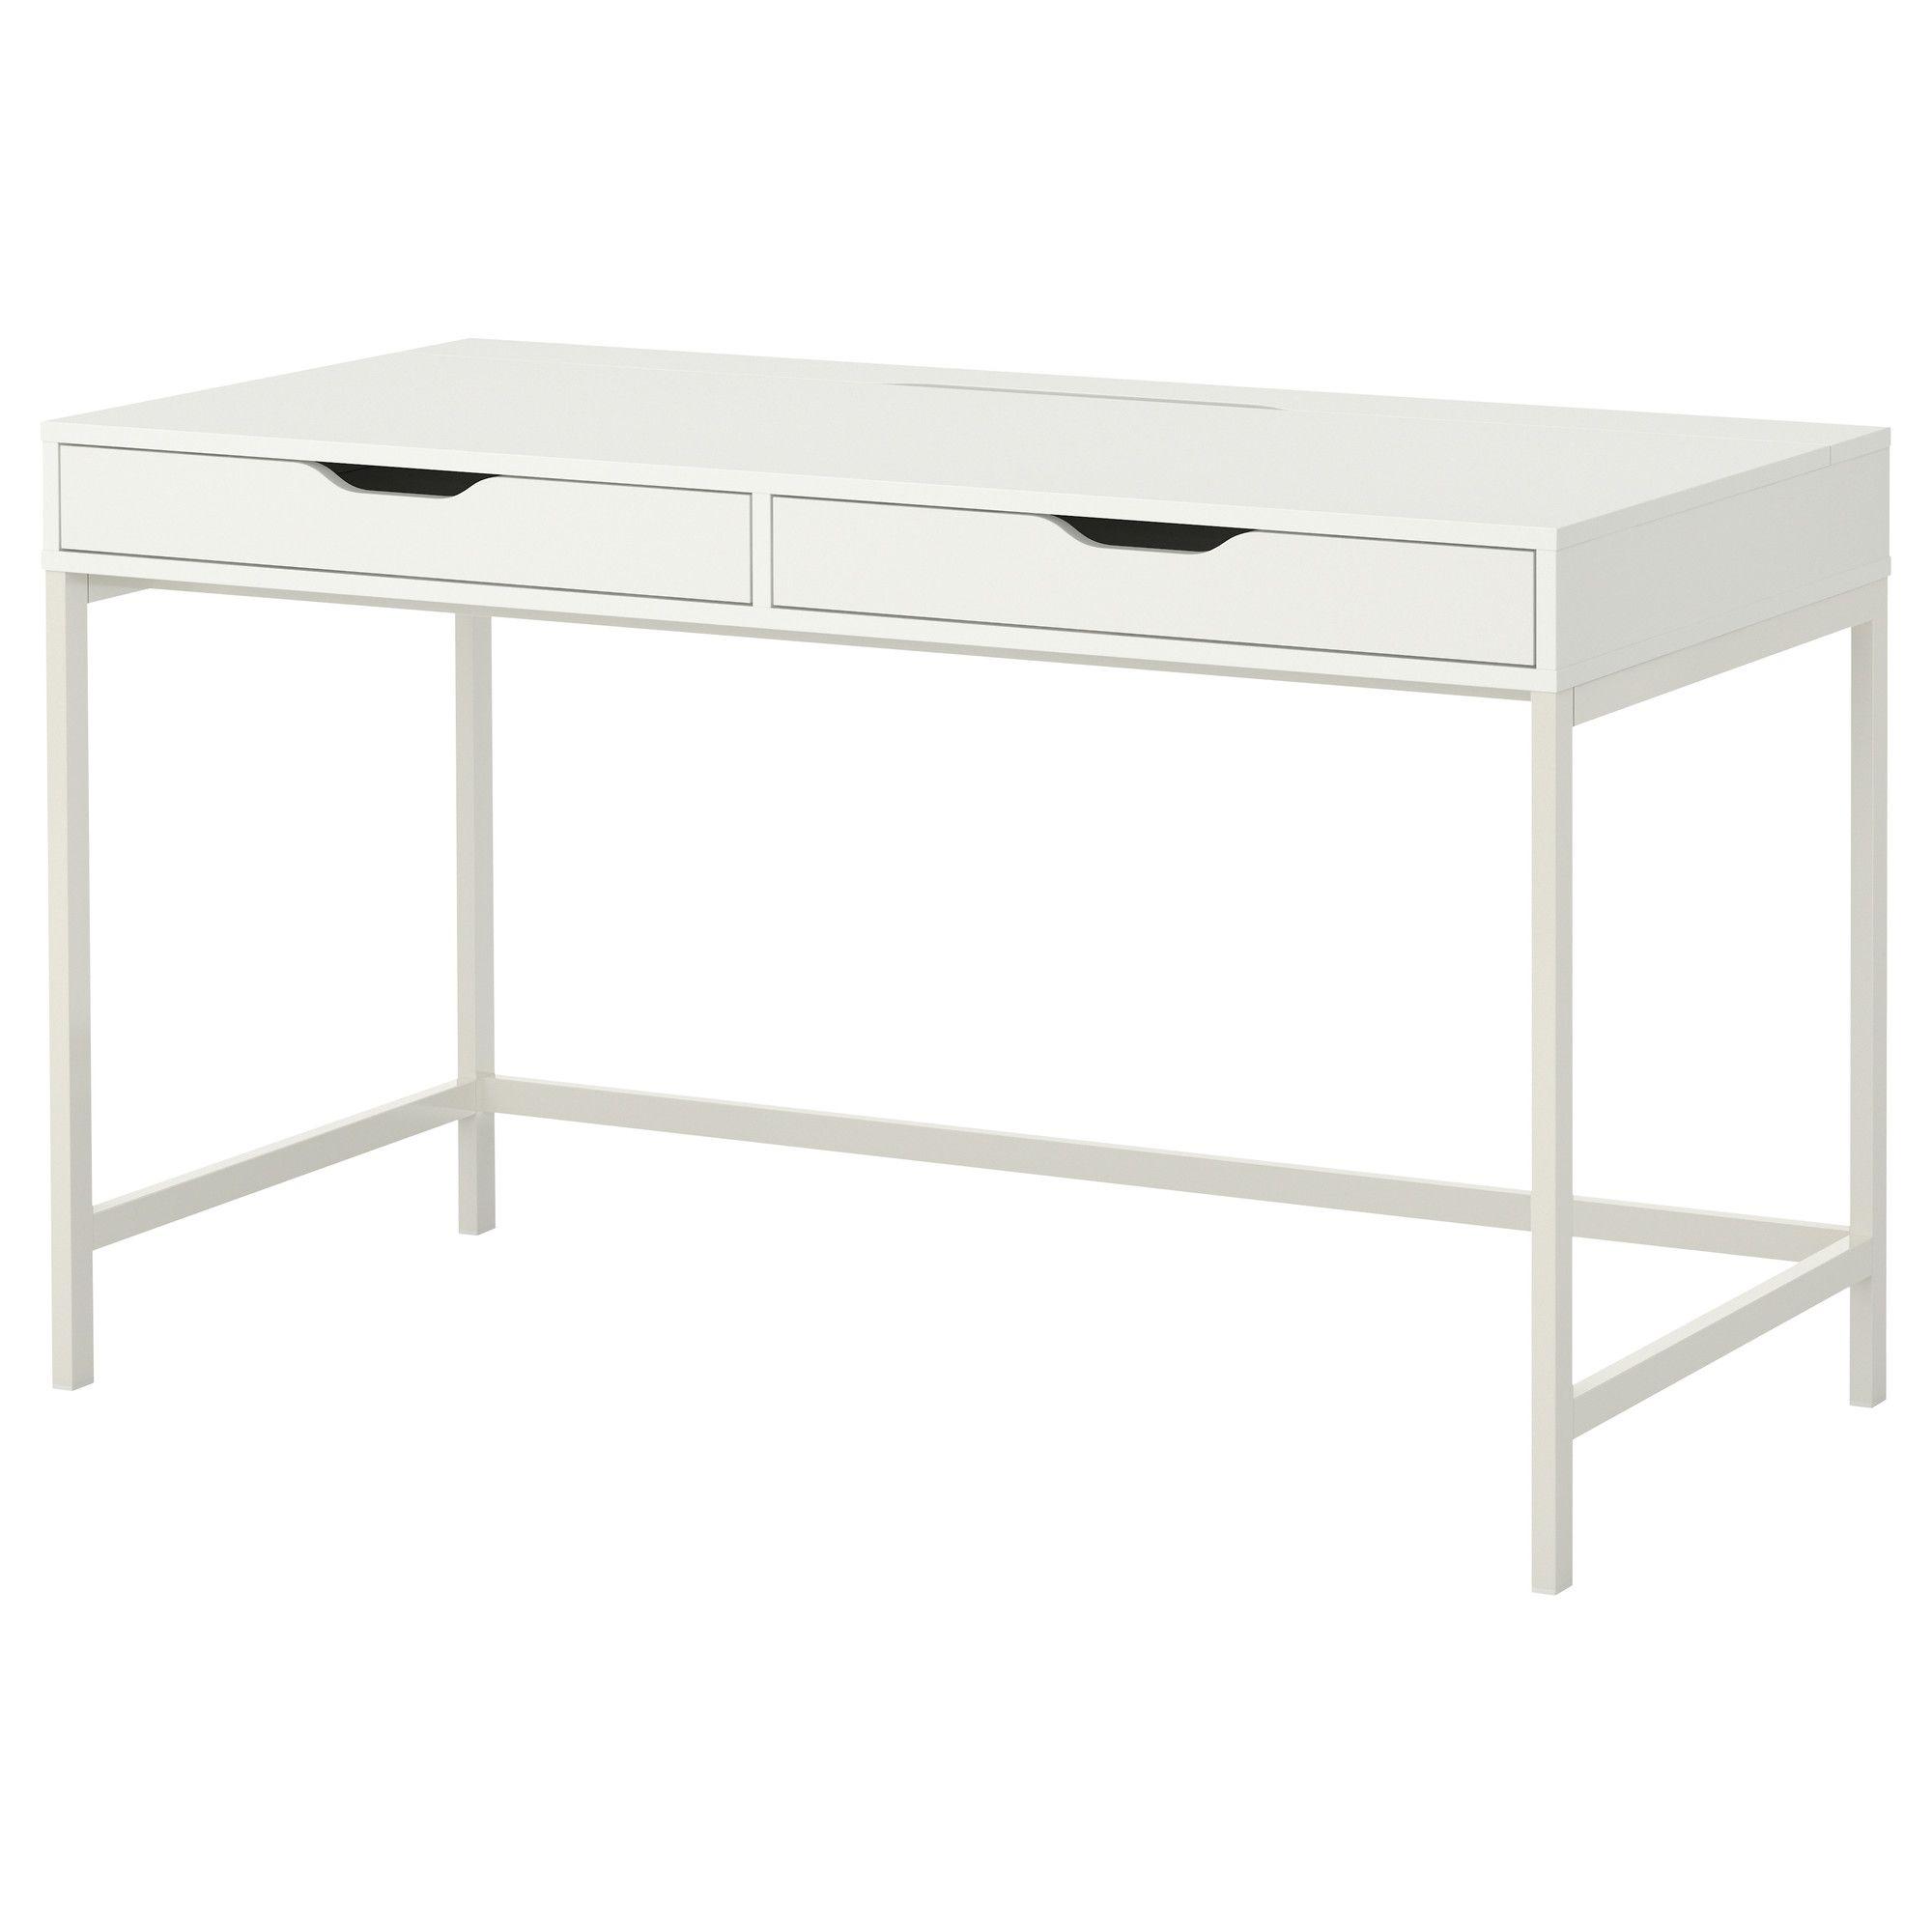 Alex Desk Gray 51 5 8x23 5 8 Ikea Ikea Alex Desk Alex Desk